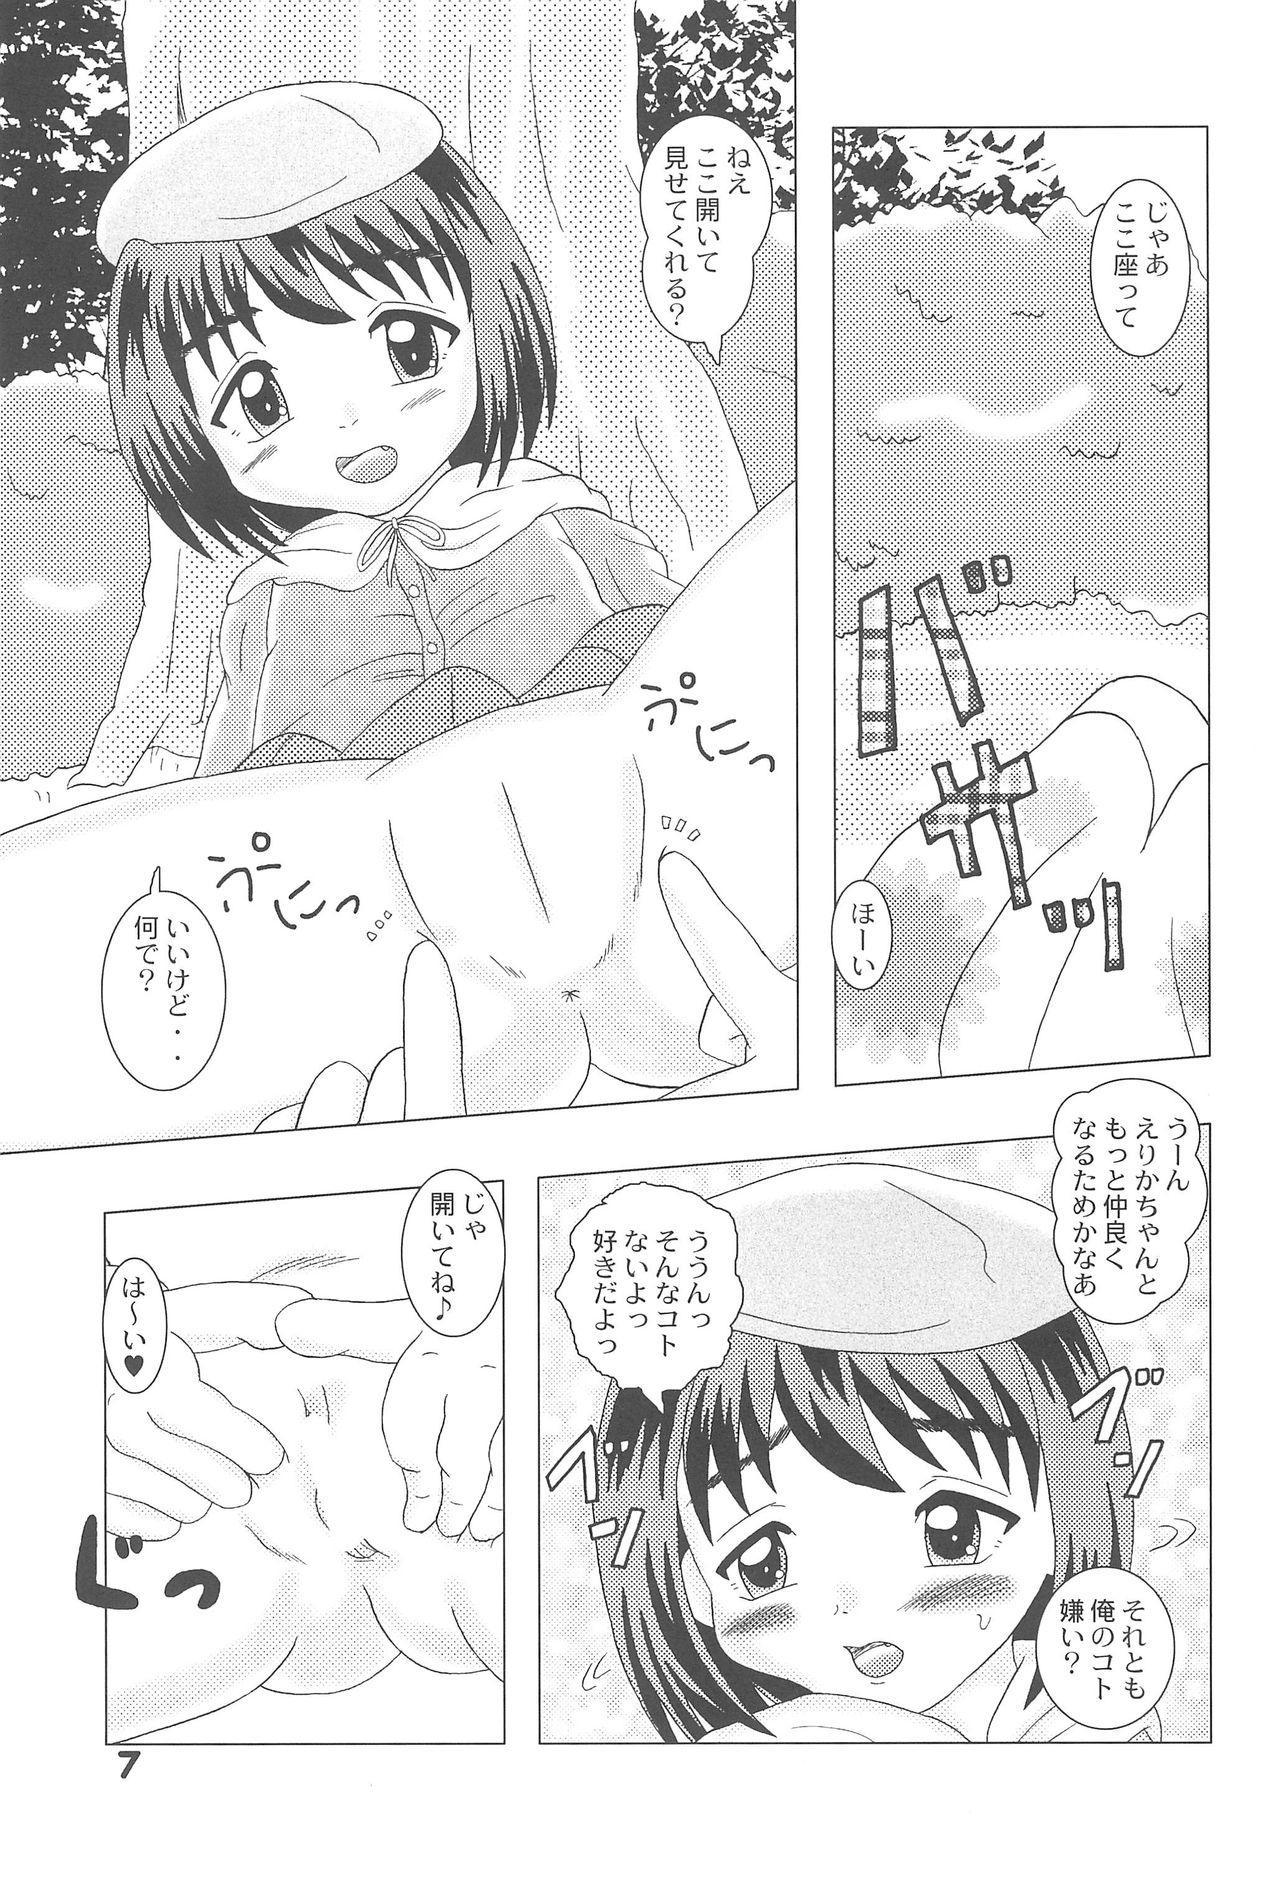 Itazura Tenshi 6